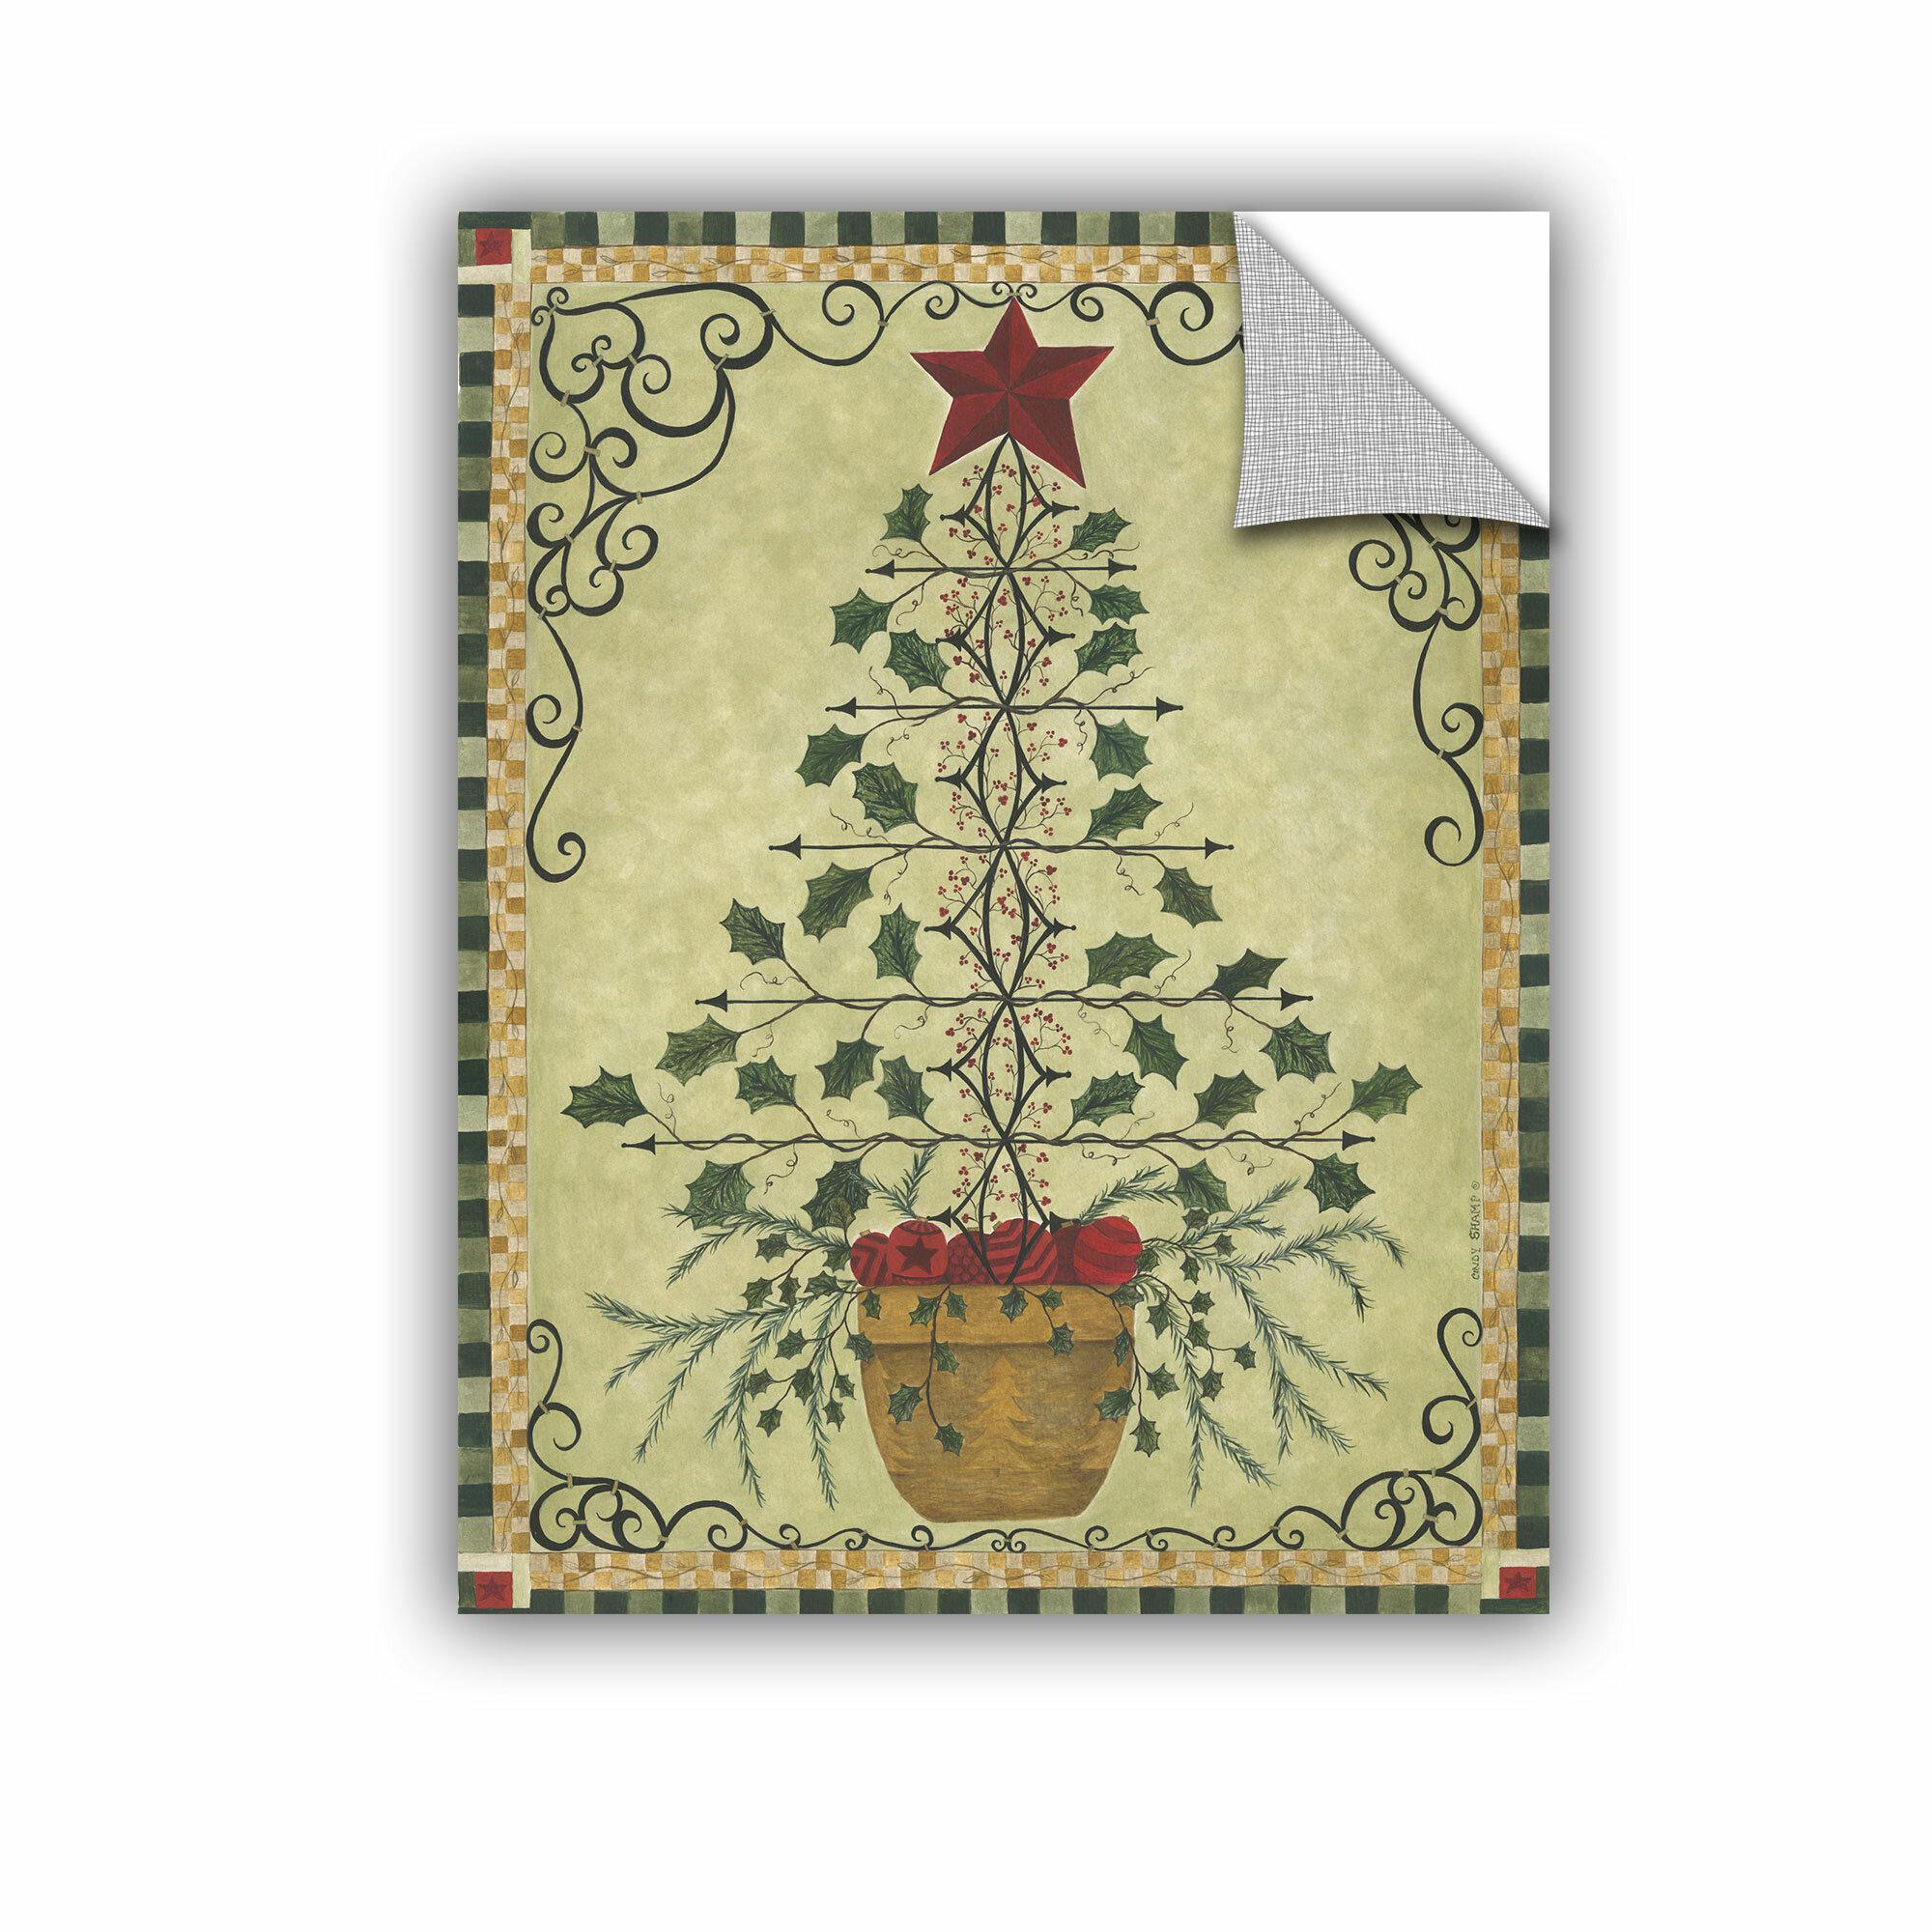 The Holiday Aisle \'Topiary Tree\' Graphic Art Print | Wayfair